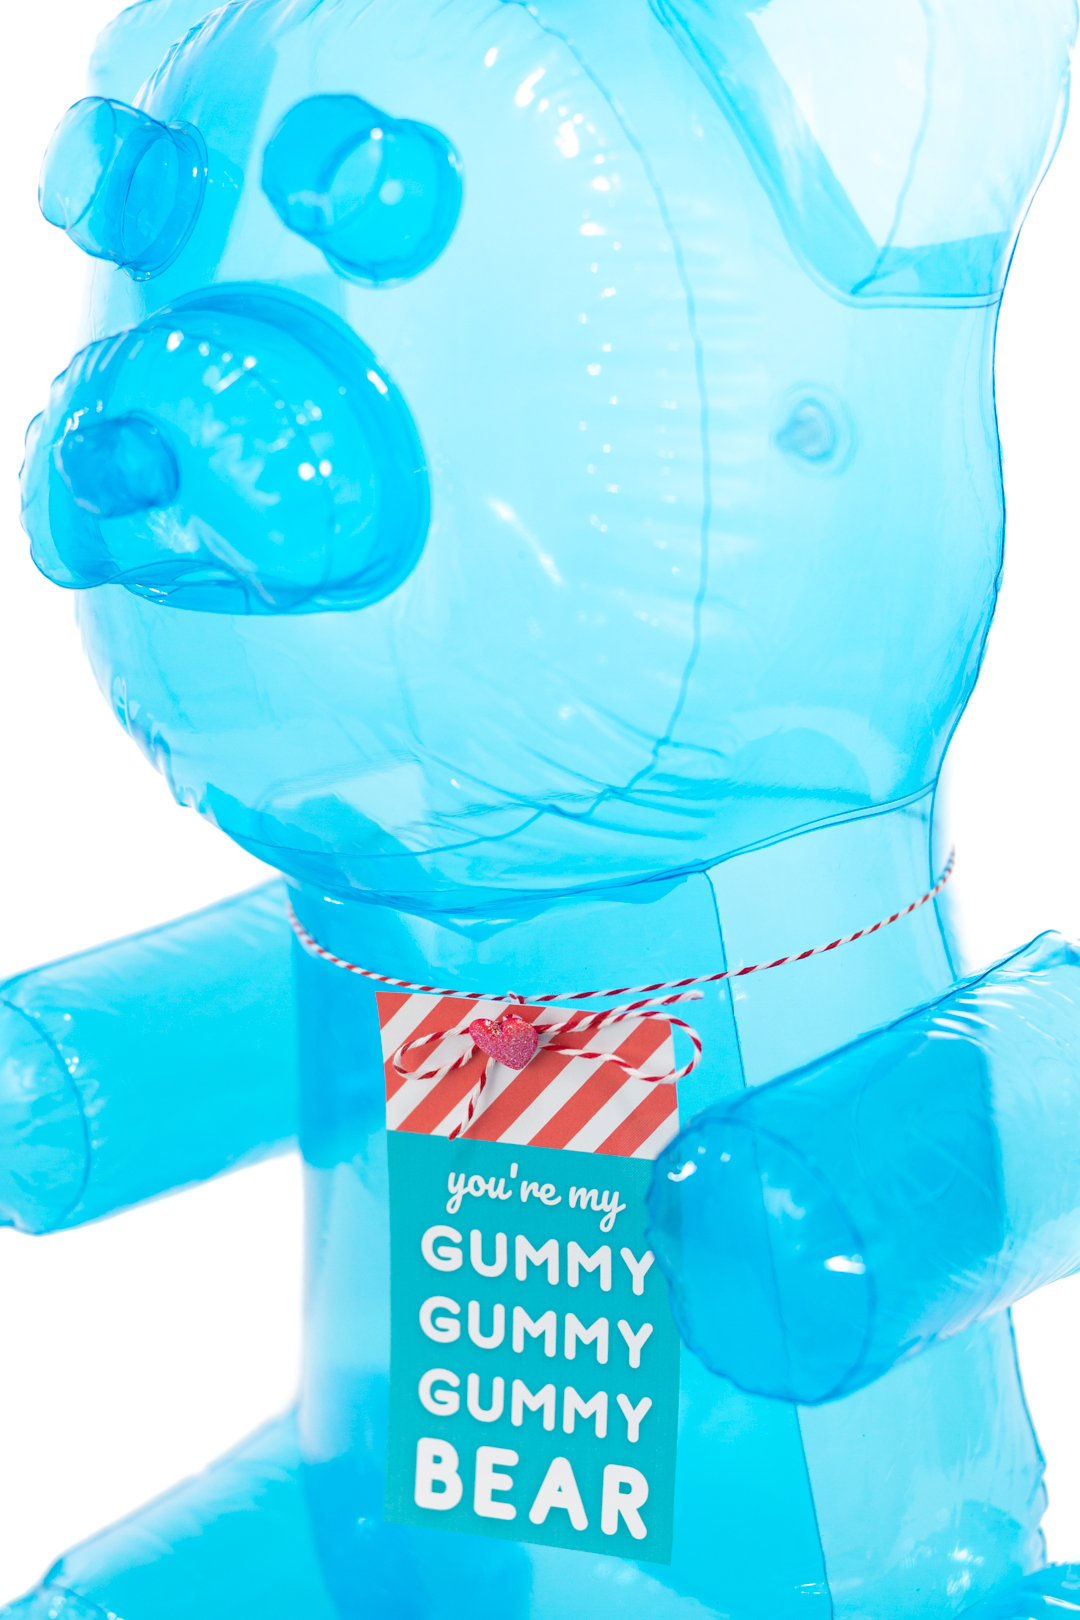 big blue inflatable gummy bear with printable gift tag for gifting